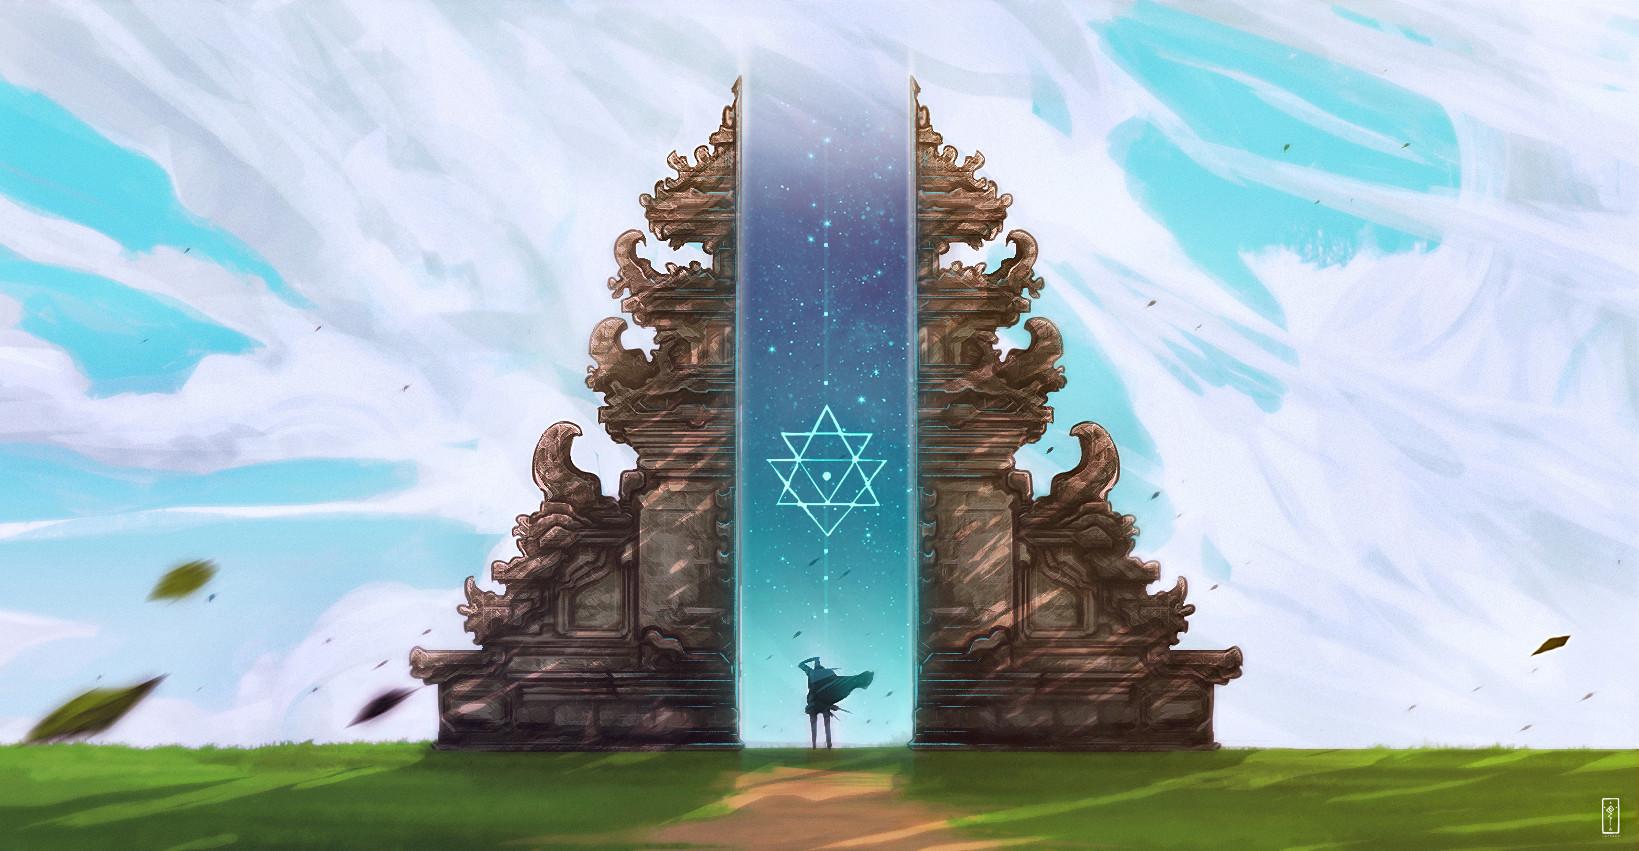 Christian benavides stw portal to my inner self